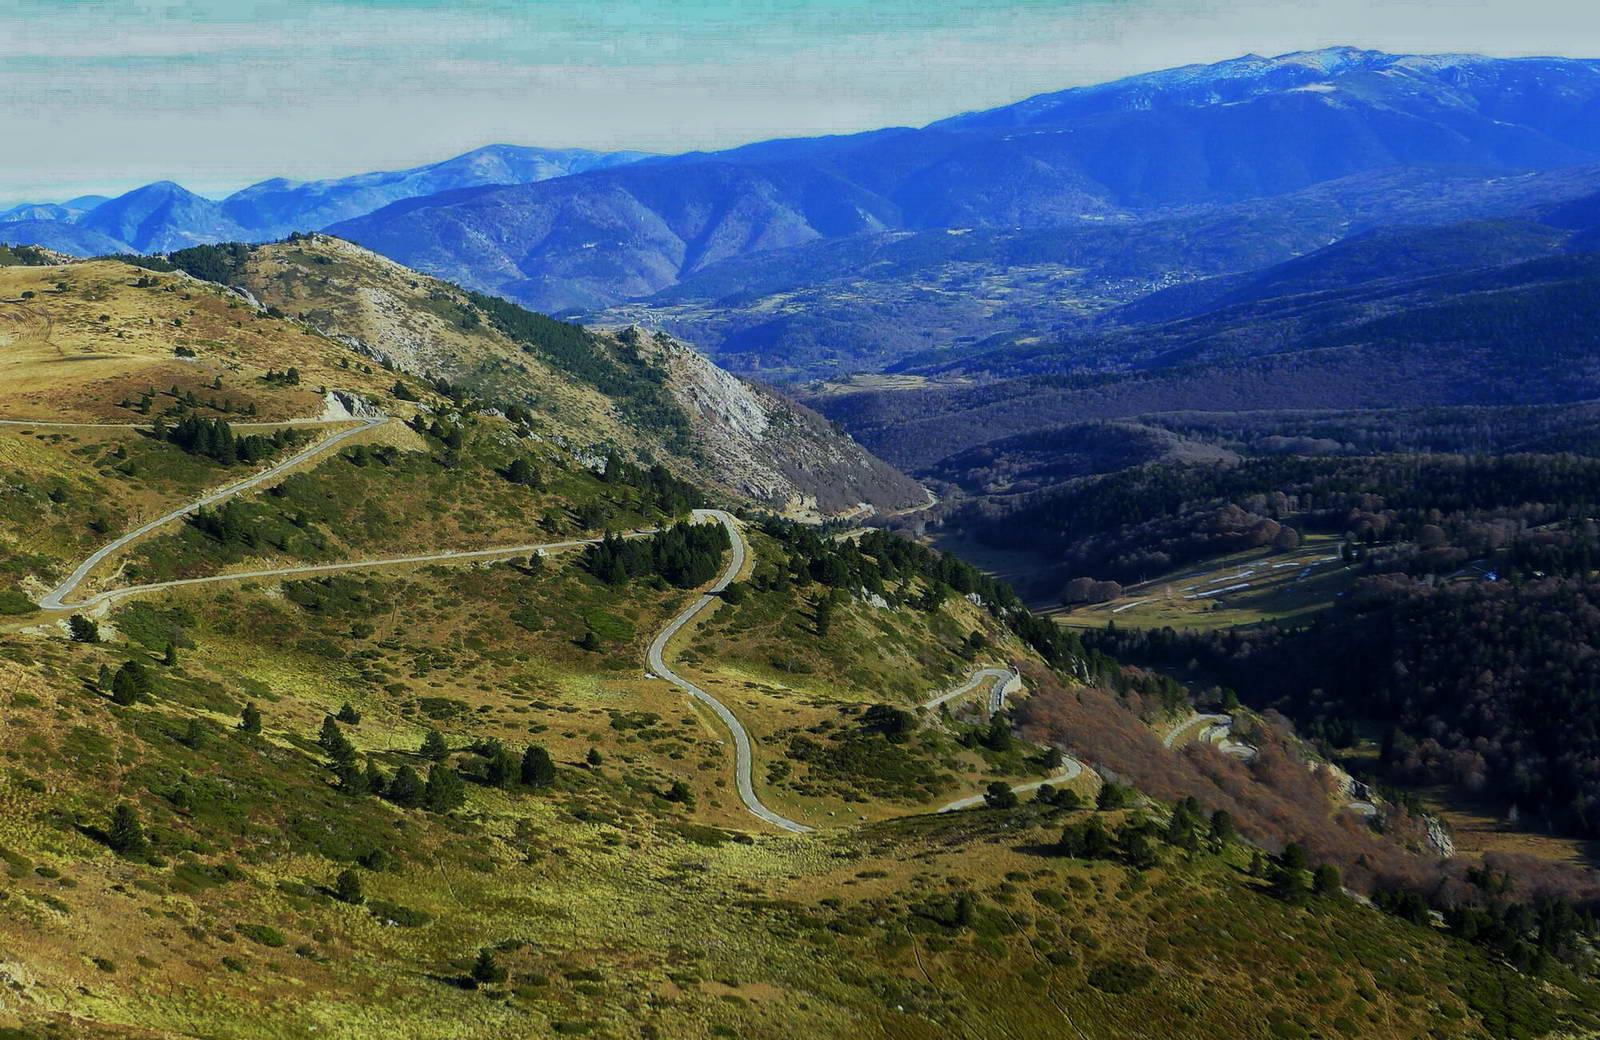 Tracks Cerdanya ROAD ruta por etapas viaje en bici carretera bicicleta Pirineos mejores puertos tour france